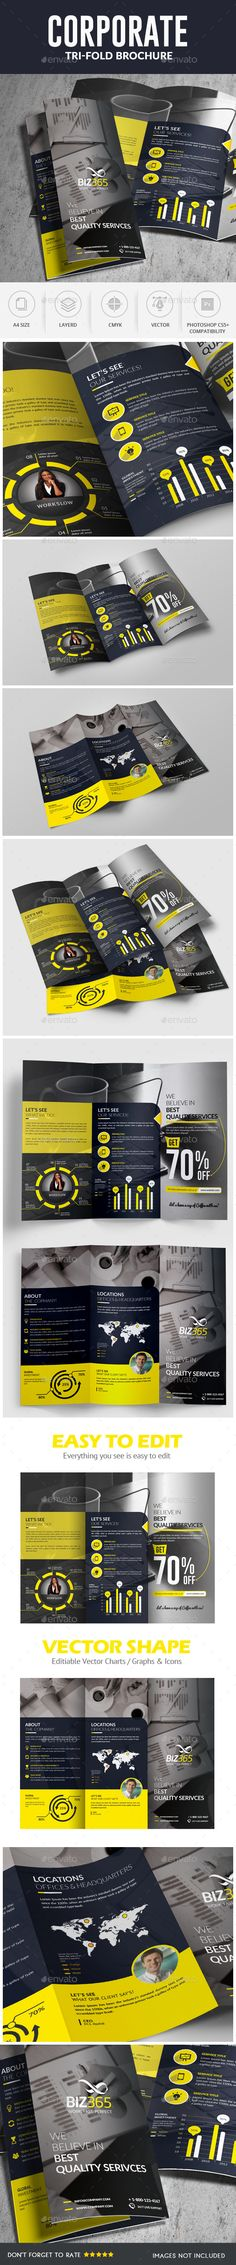 Corporate Trifold Brochure Template PSD #design Download: http://graphicriver.net/item/corporate-trifold-brochure/14152820?ref=ksioks